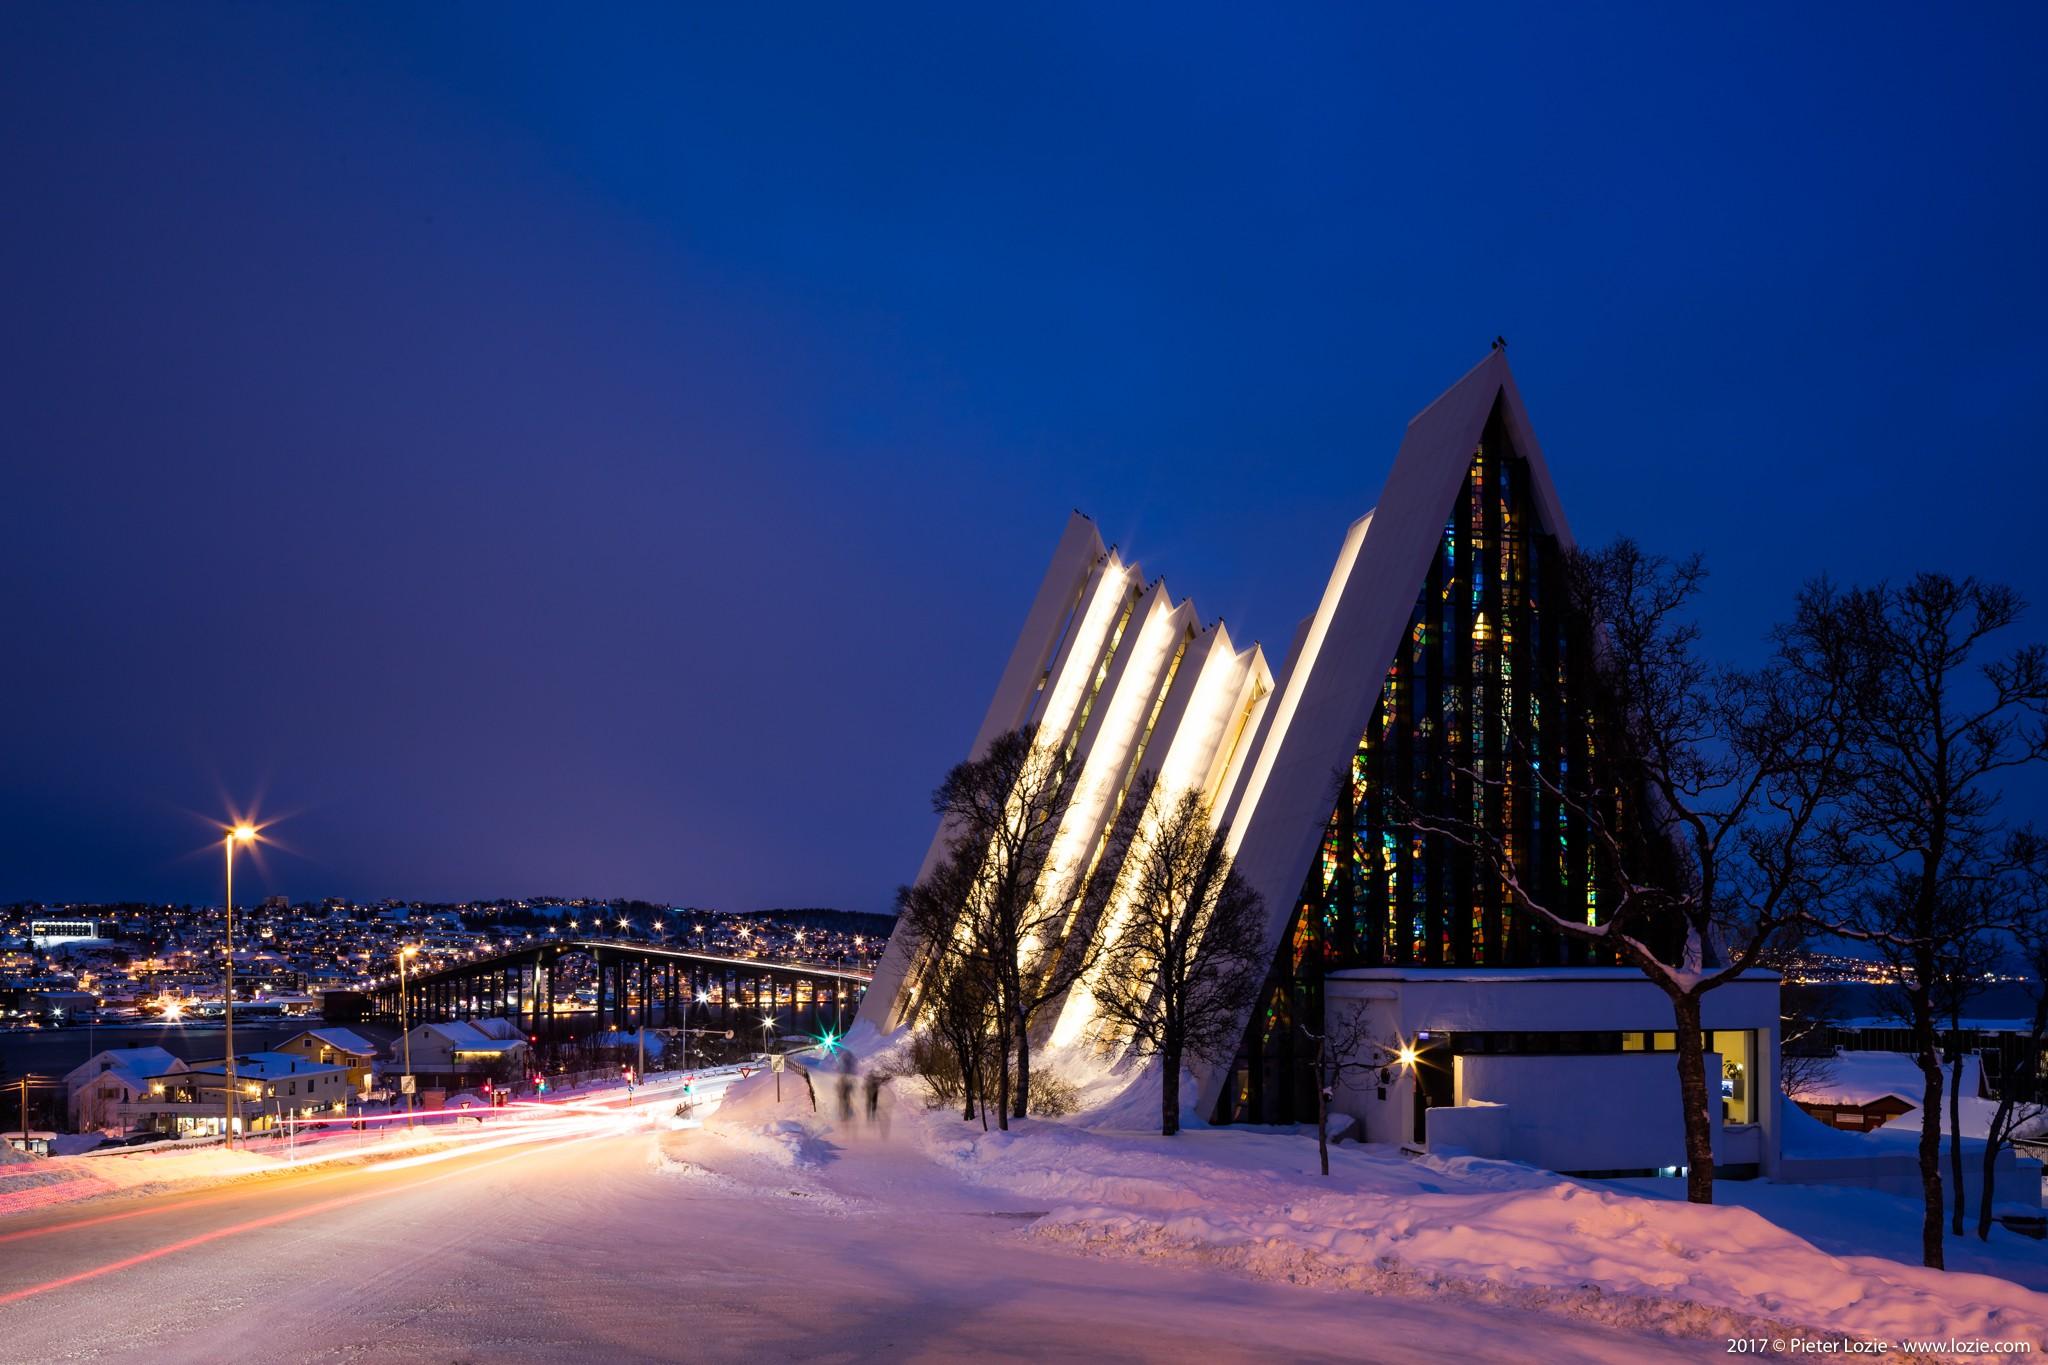 Northern Lights Finland 2017